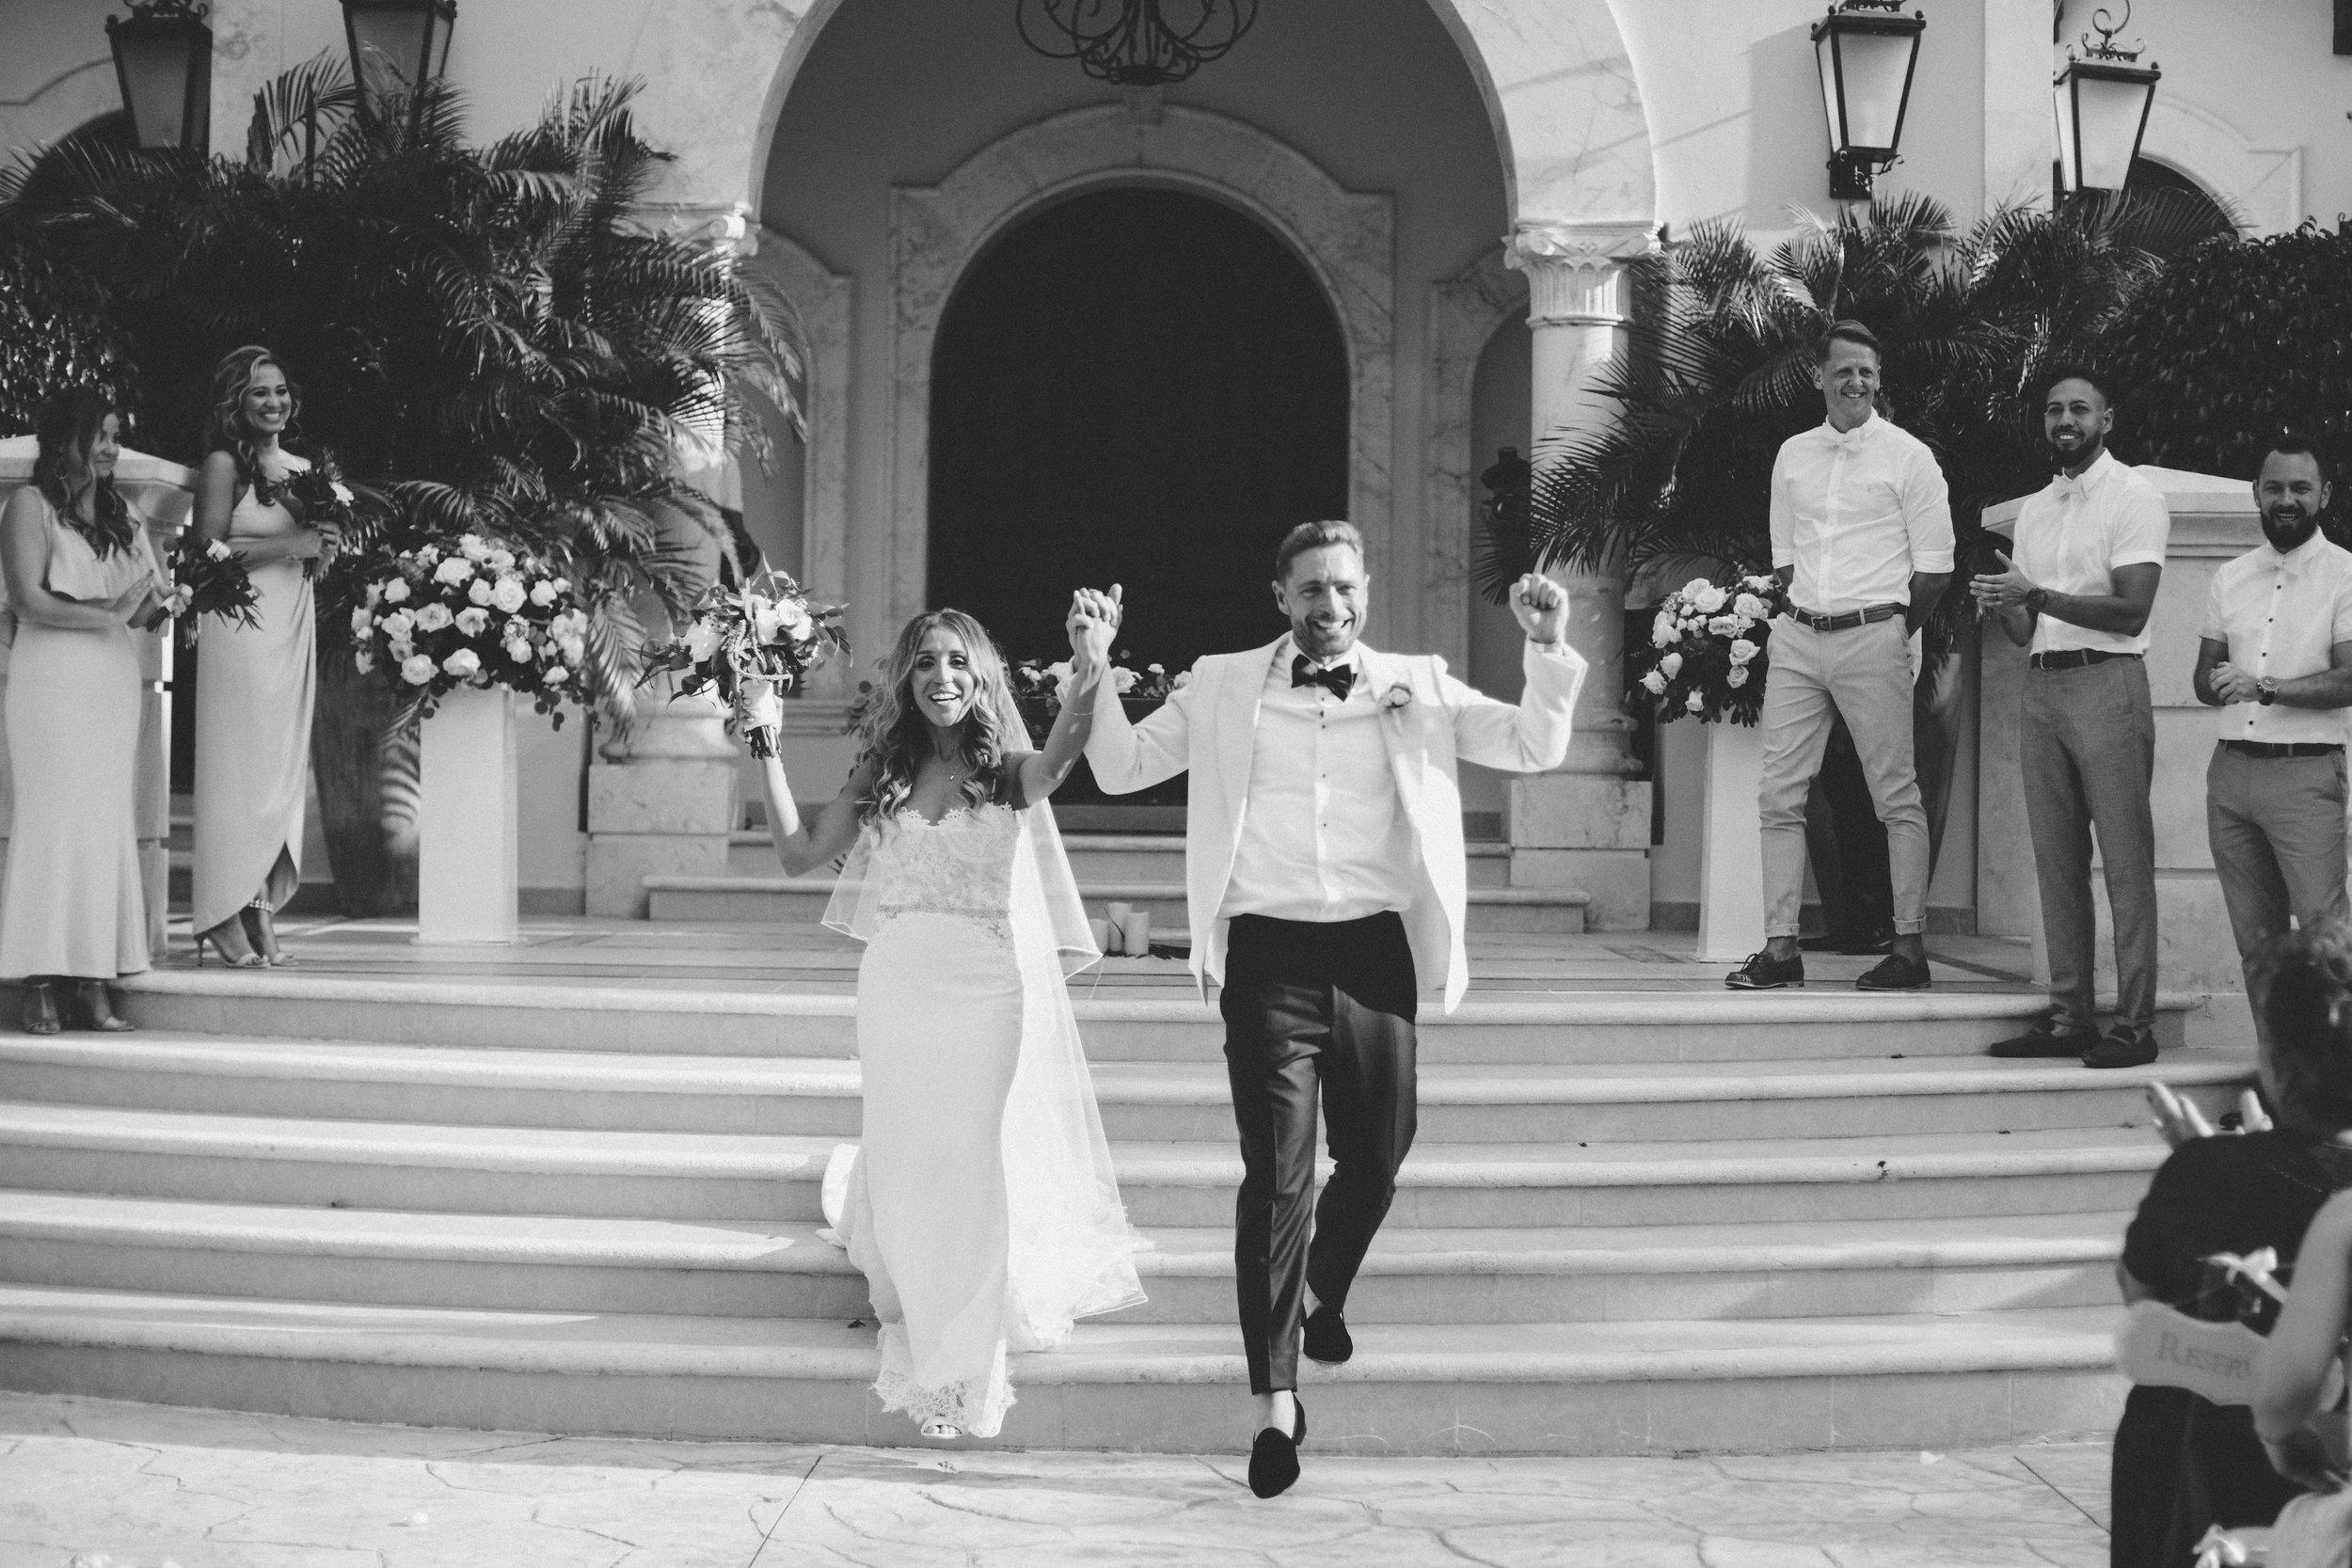 mexico_wedding_cancun_villa_la_joya_evangeline_lane_067.jpg